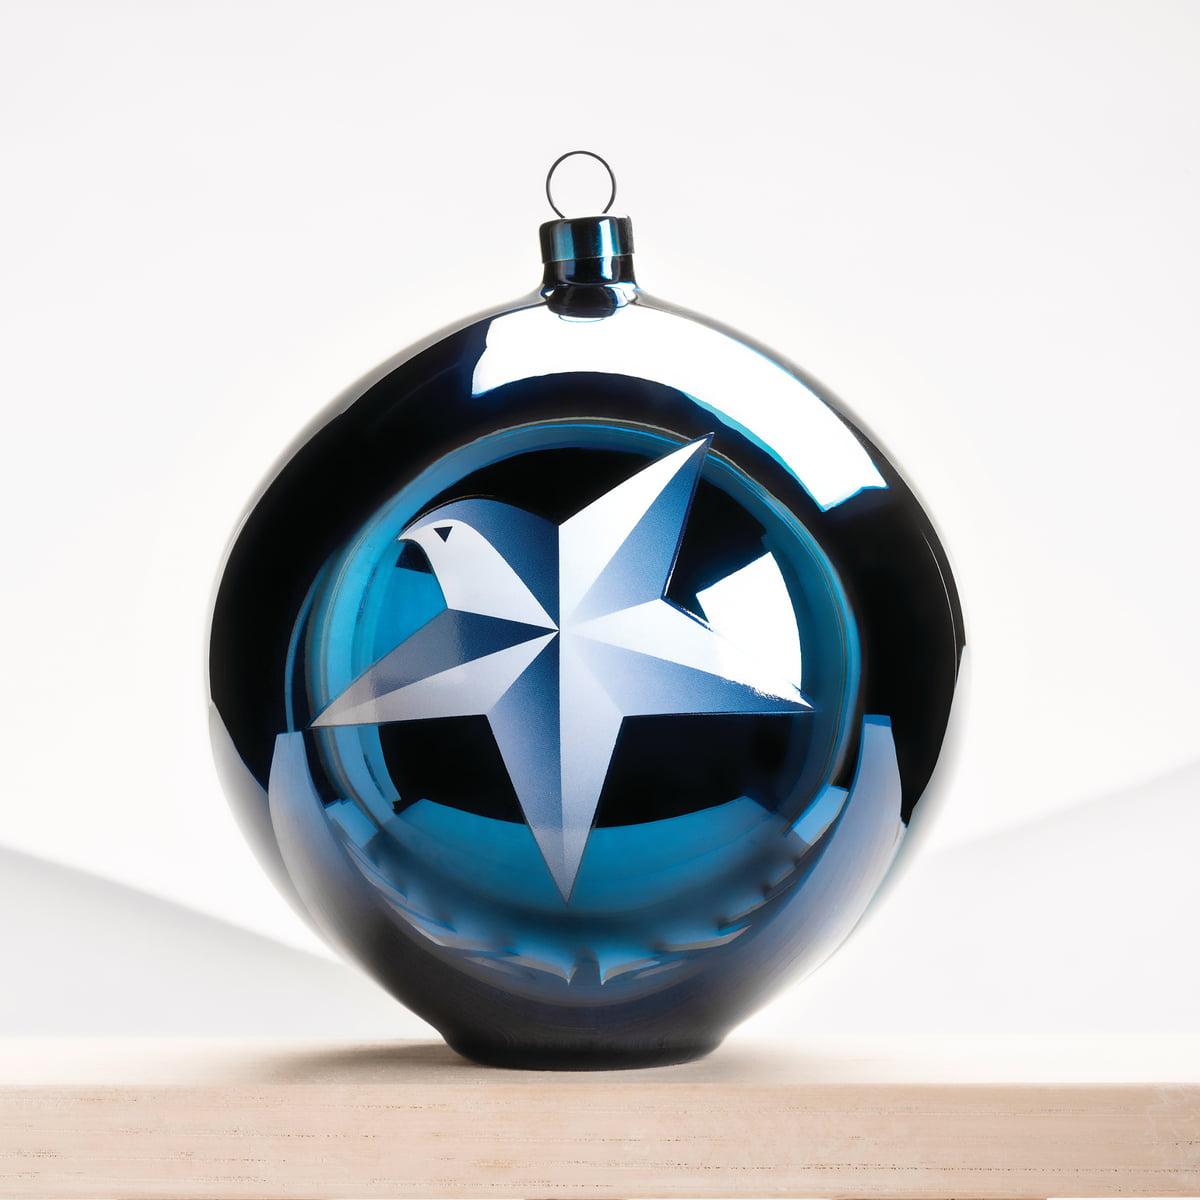 Bauhaus Christbaumkugeln.Alessi Blue Christmas Christmas Baubles Angel